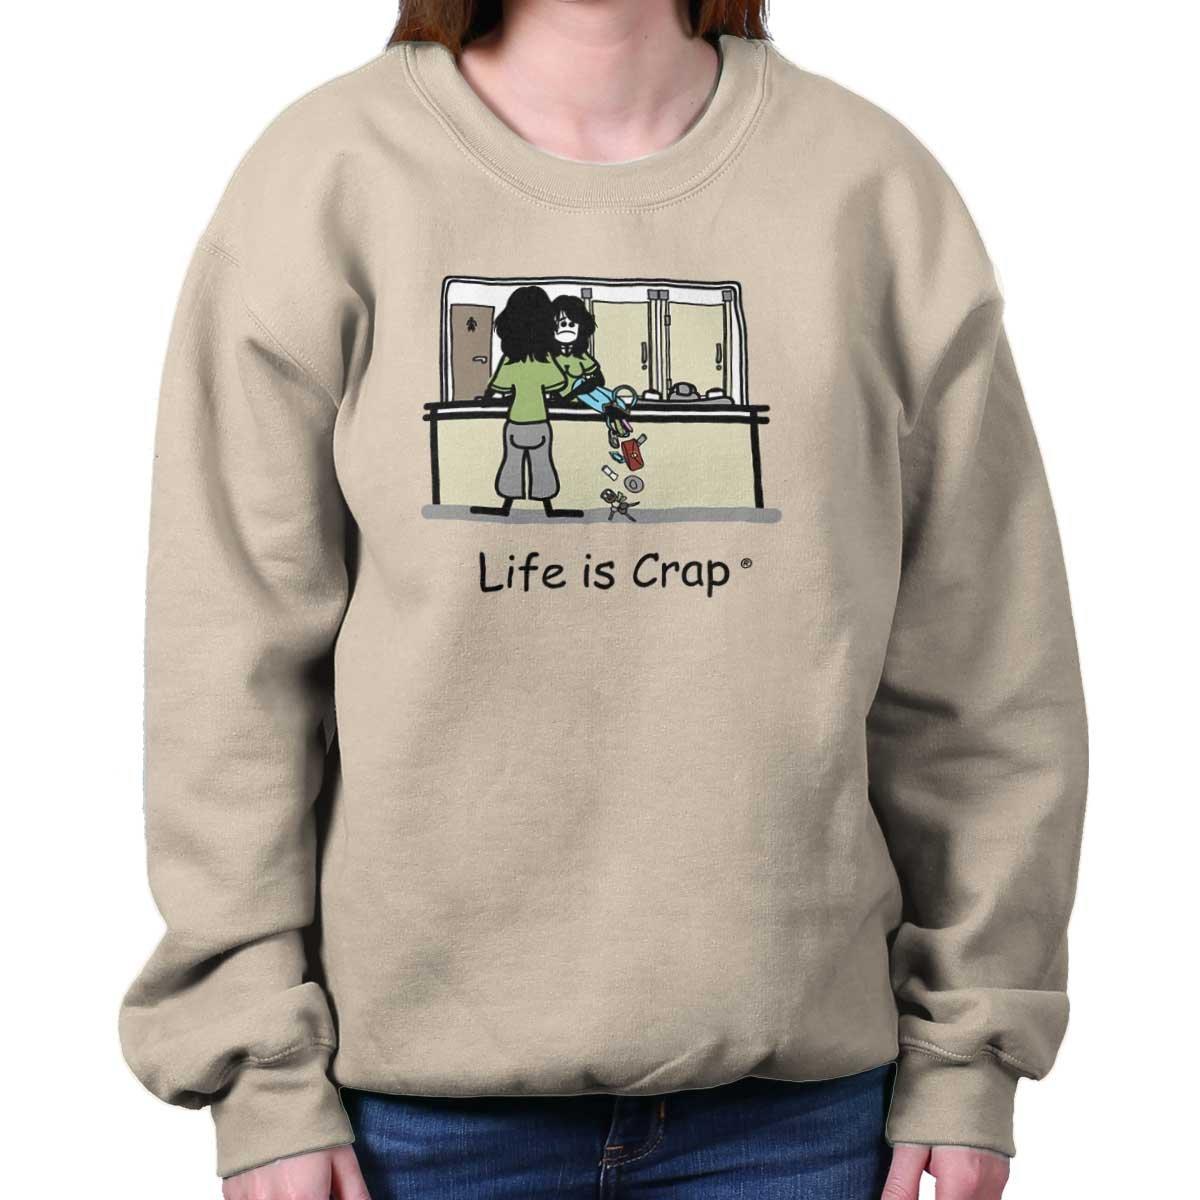 Life is Crap Spilled Purse Funny Shirt | Sarcastic Gift Idea Sweatshirt